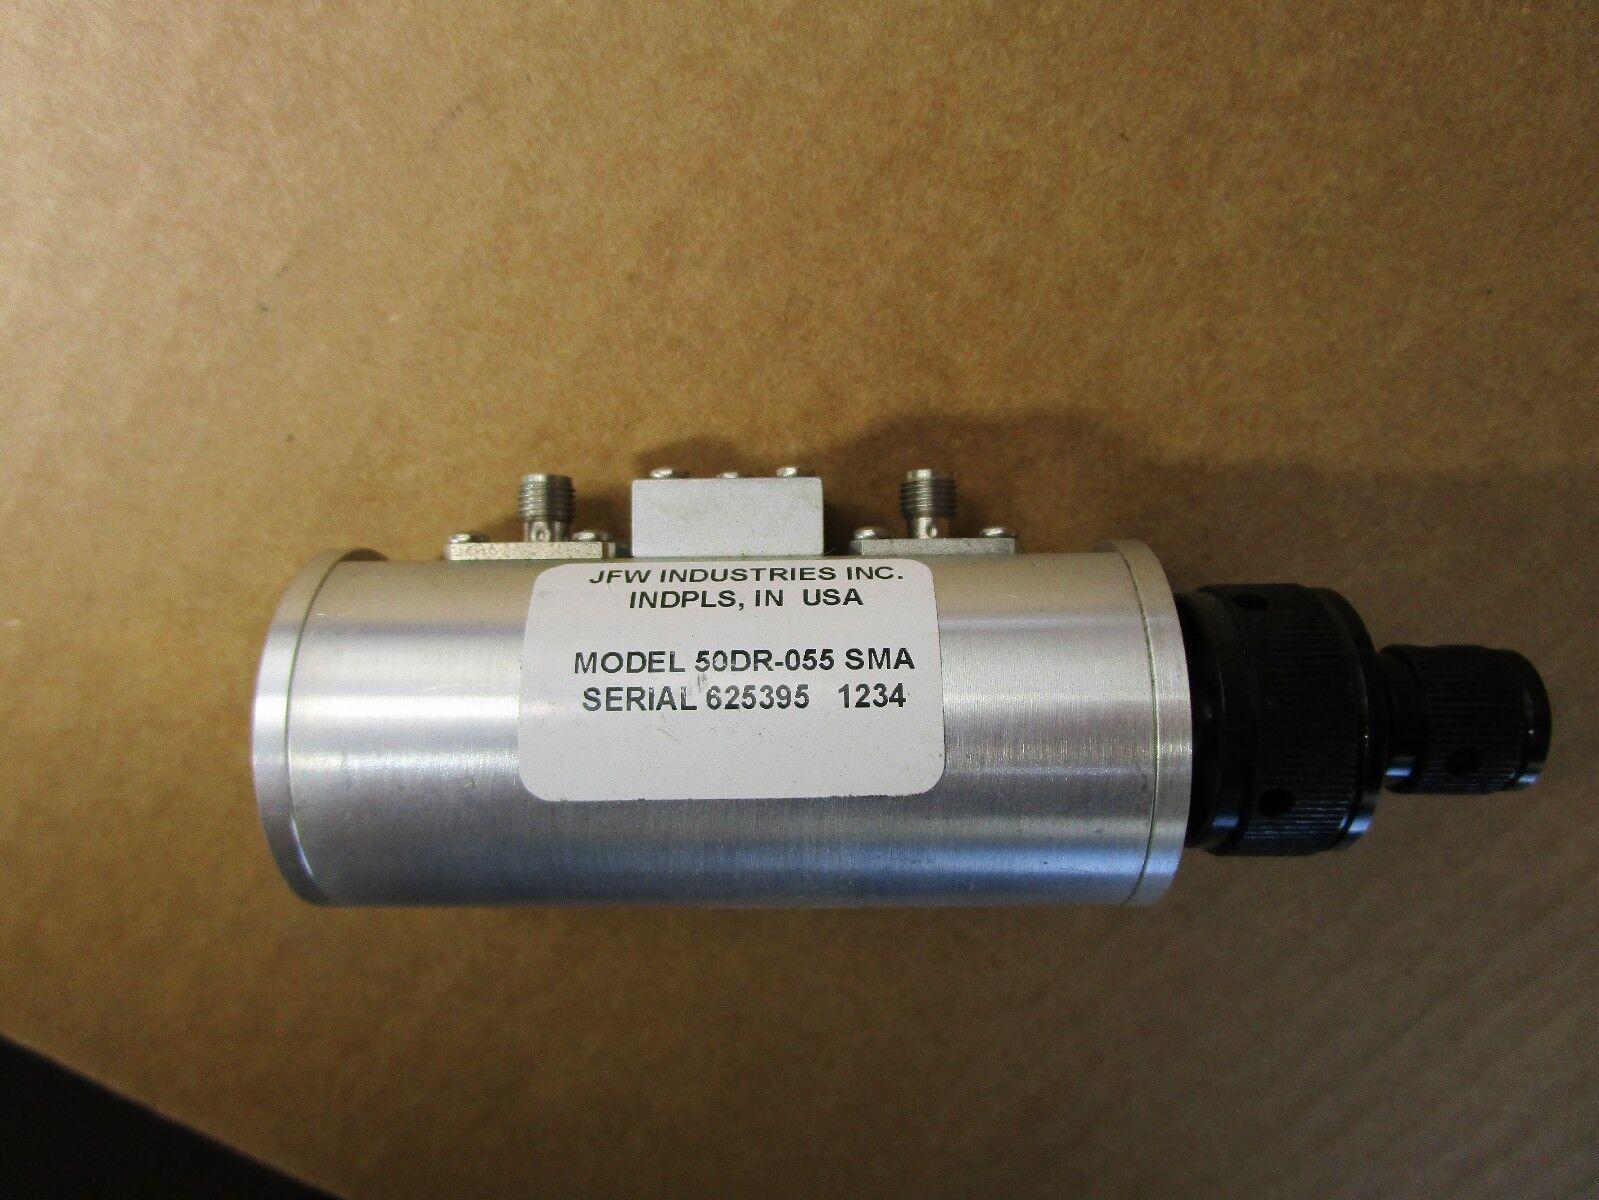 2 pcs A758KK187M1CAAE014 KEMET Polymer Kondensator 180uF 16V 14mR 8x8 RM3,5 #BP